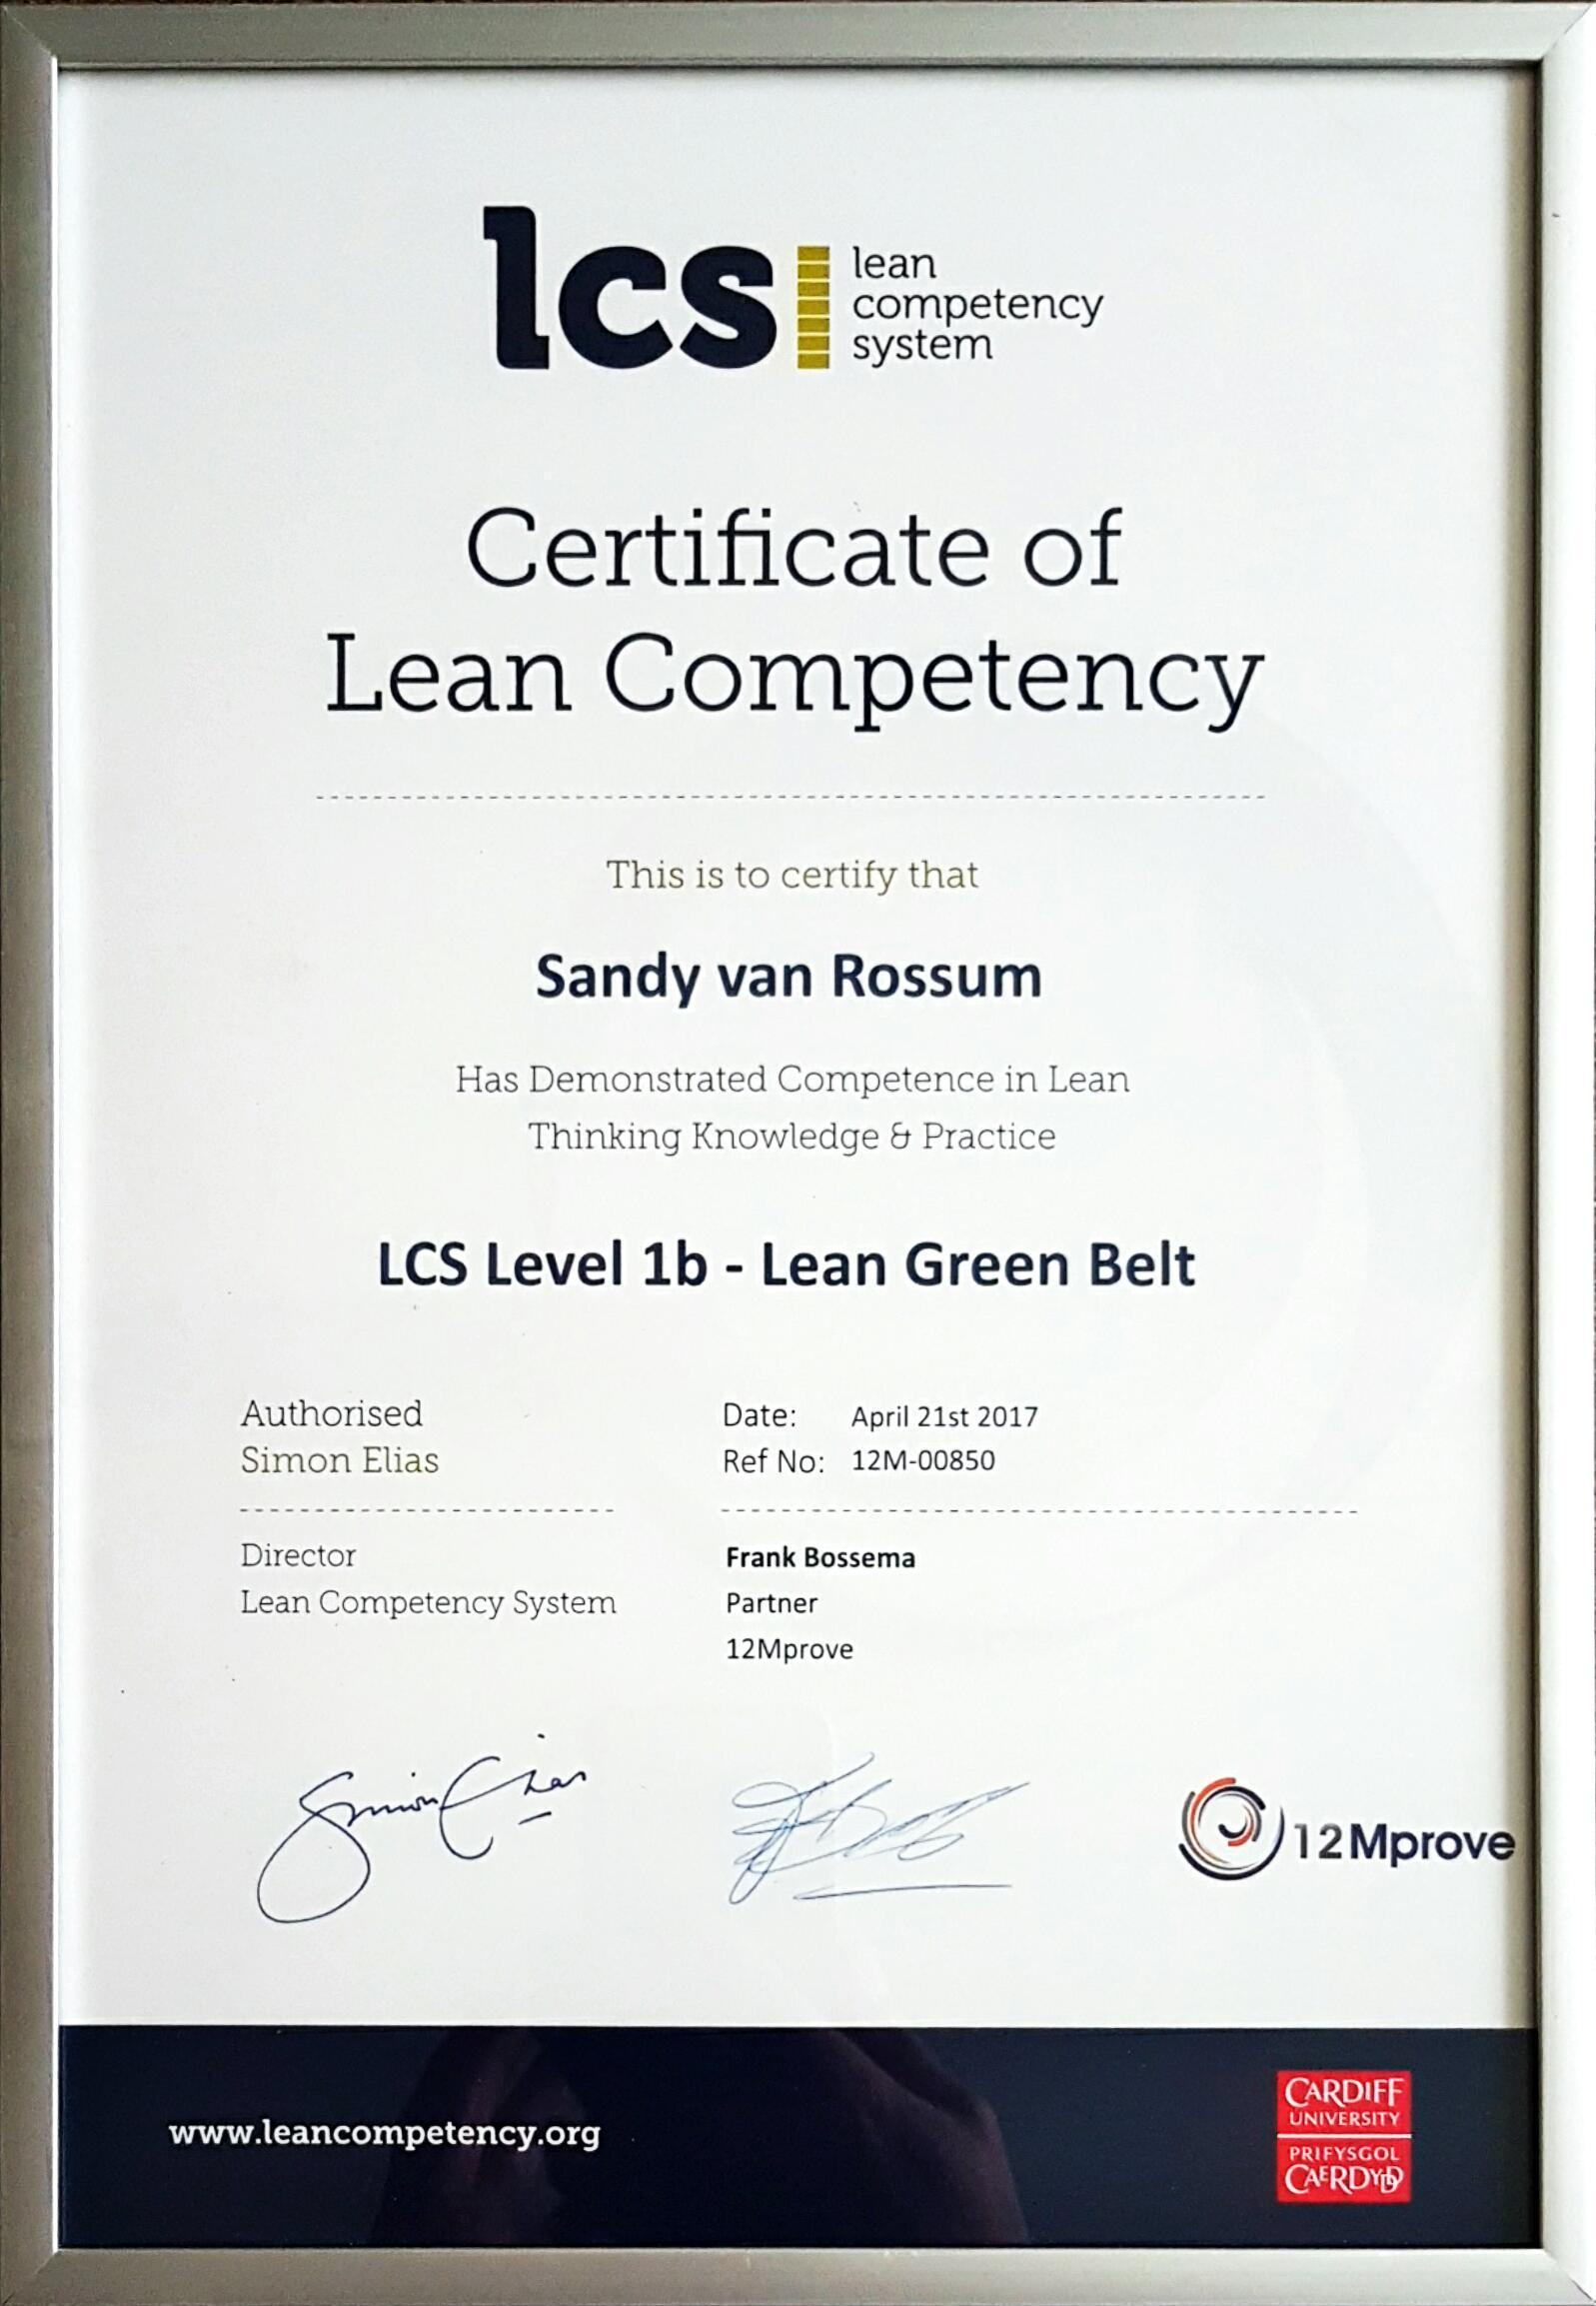 Sandy van Rossum LCS Level 1b Lean Green Belt